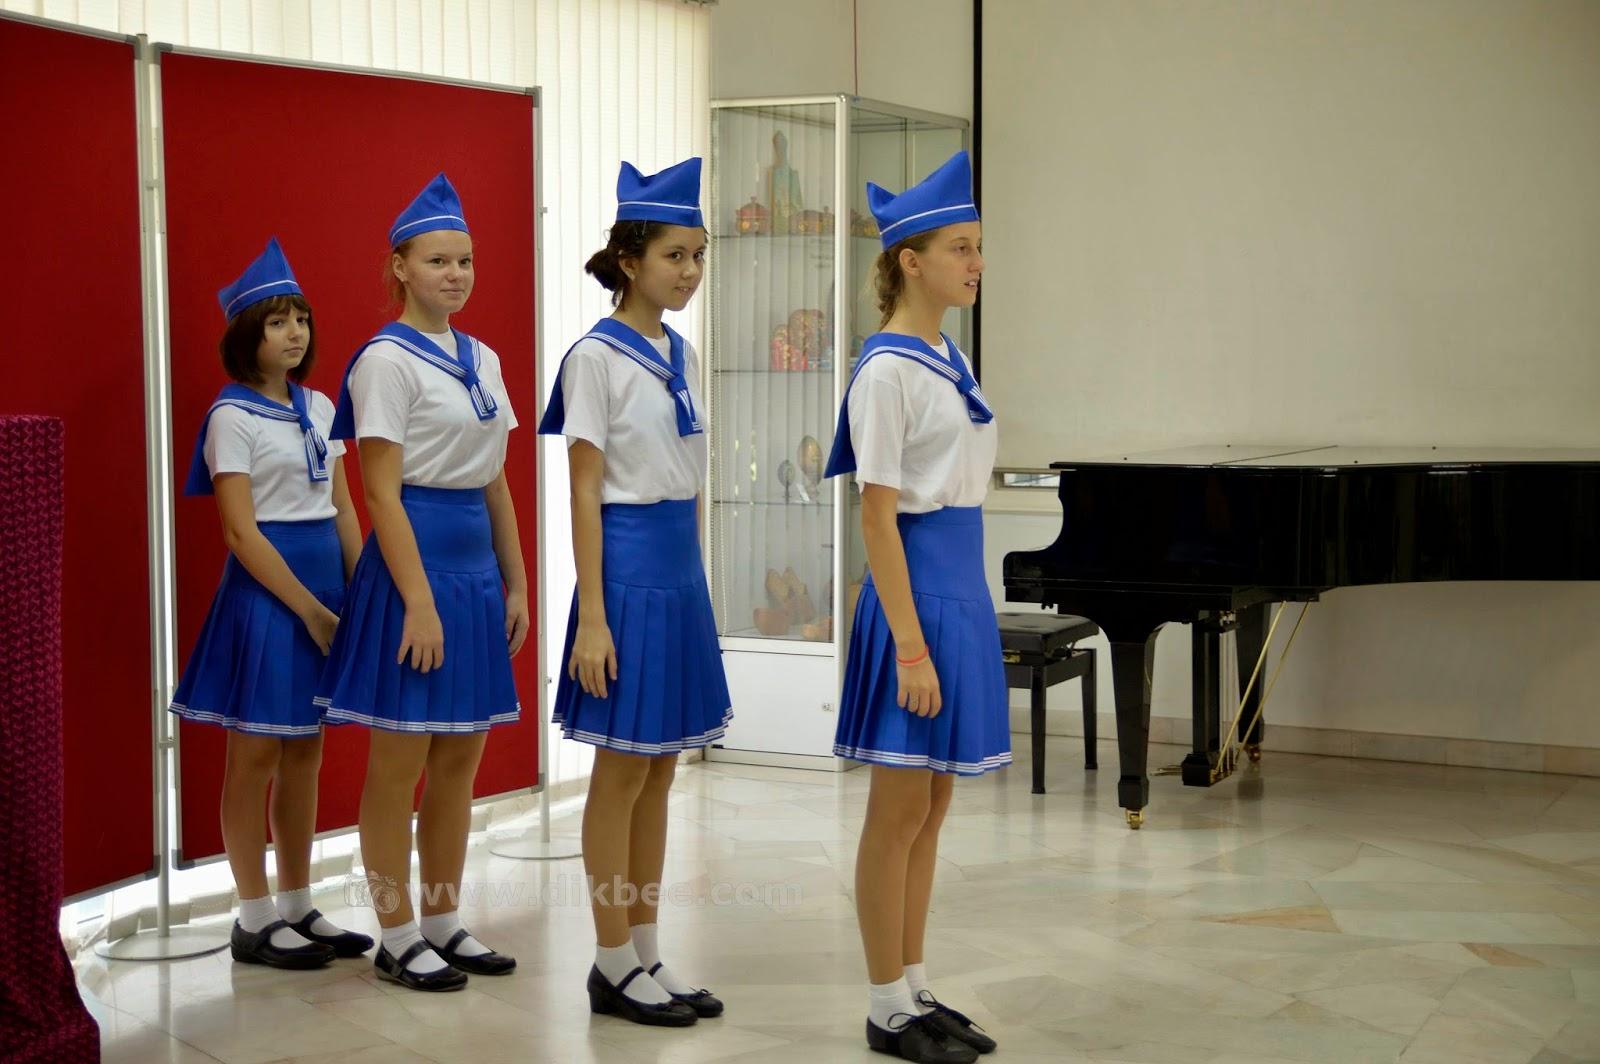 Persembahan Tarian Dari Rusia | Lunch Bersama Media